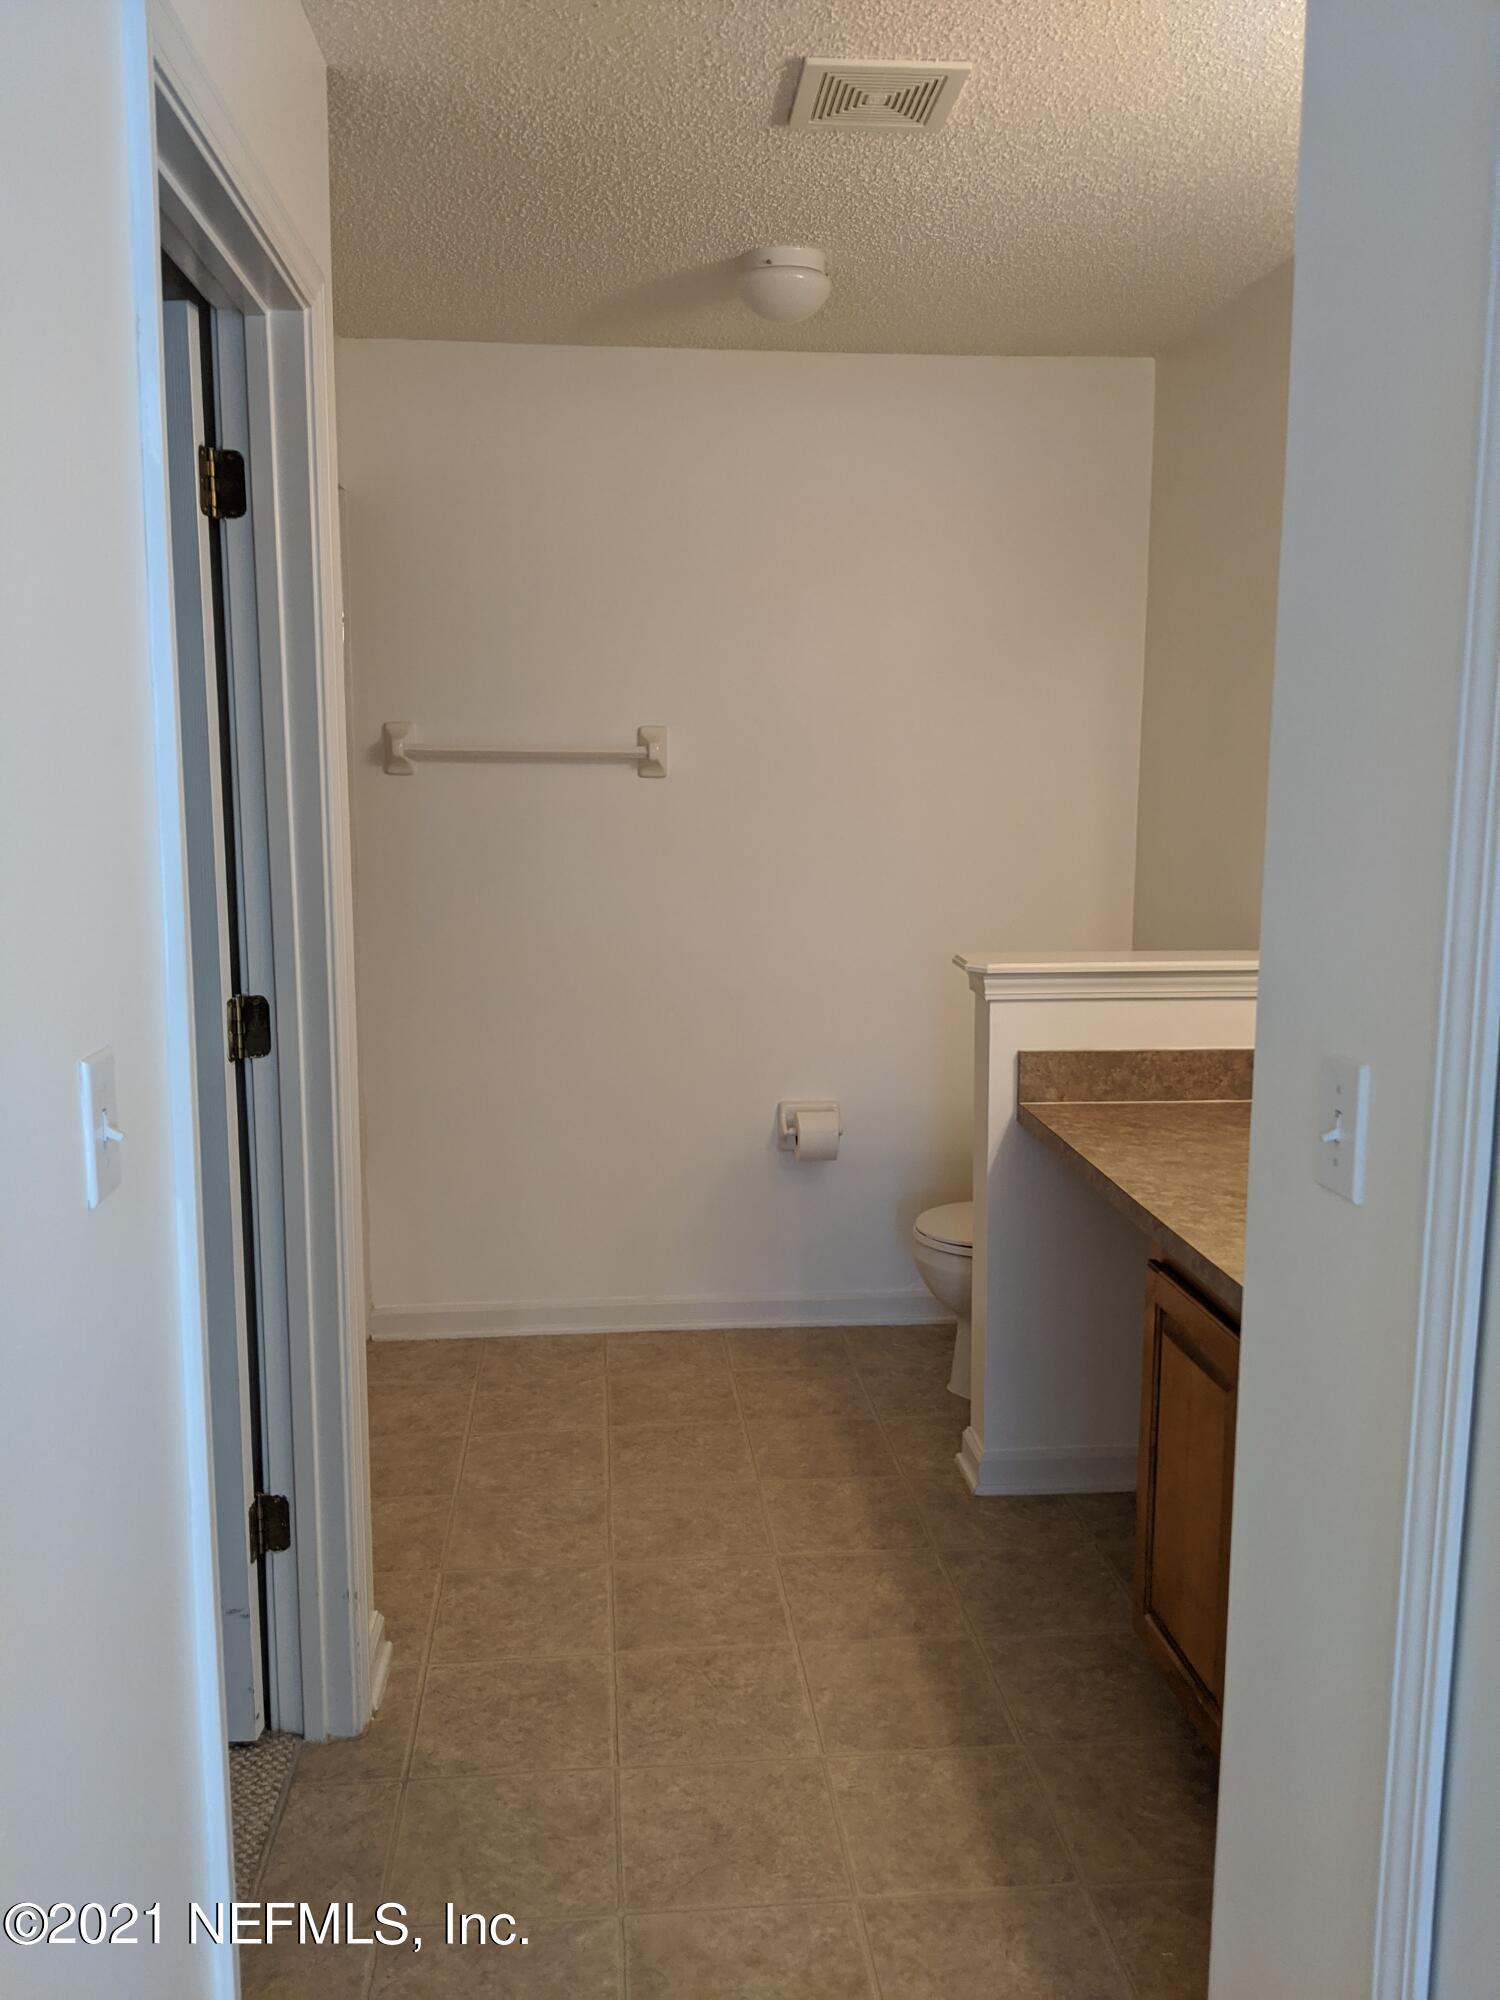 2627 TUSCANY GLEN, ORANGE PARK, FLORIDA 32065, 3 Bedrooms Bedrooms, ,2 BathroomsBathrooms,Residential,For sale,TUSCANY GLEN,1121345